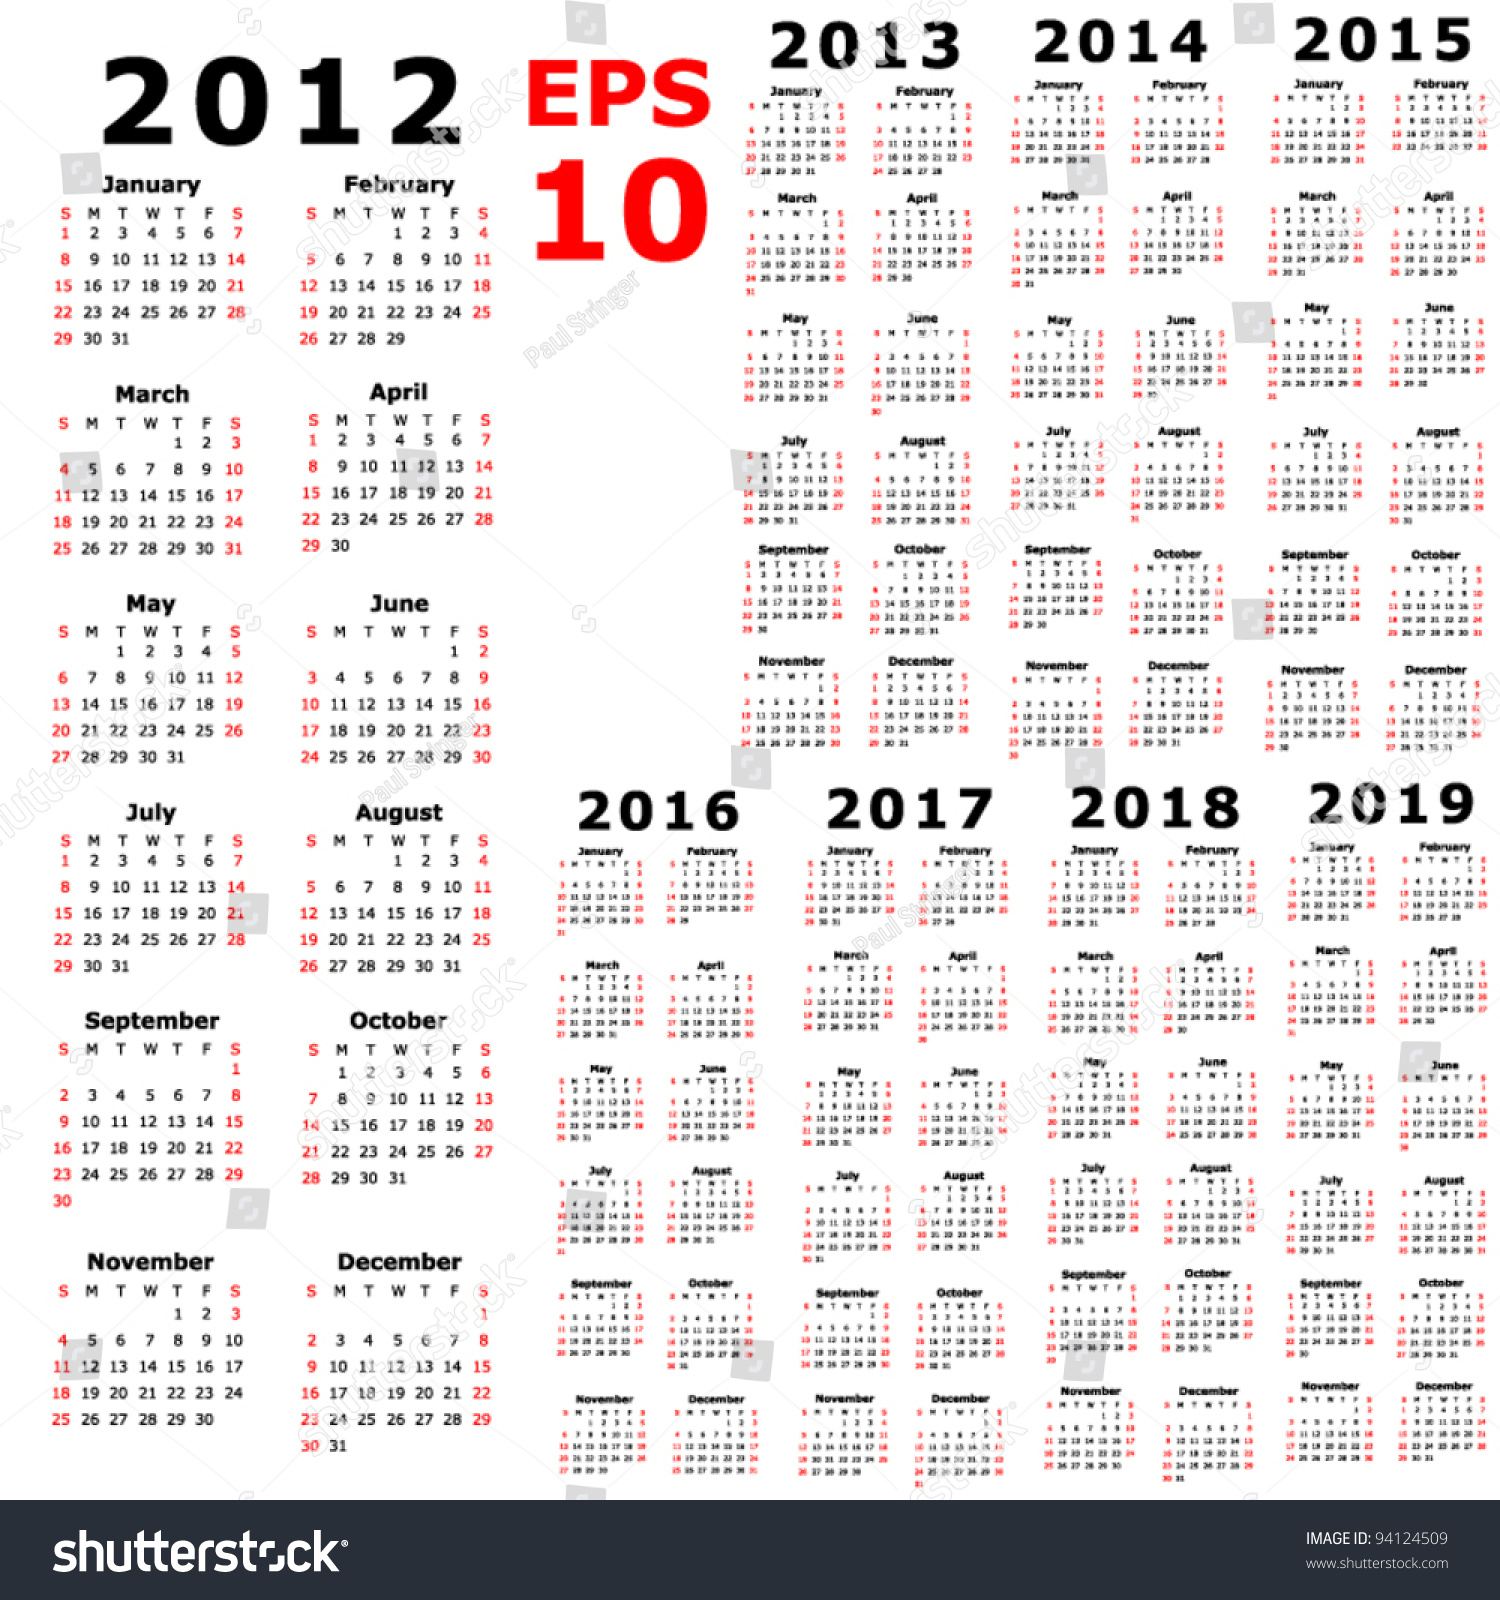 2013 And 2014 And 2019 Calendar Calendar 2012 2013 2014 2015 2016 Stock Vector (Royalty Free) 94124509